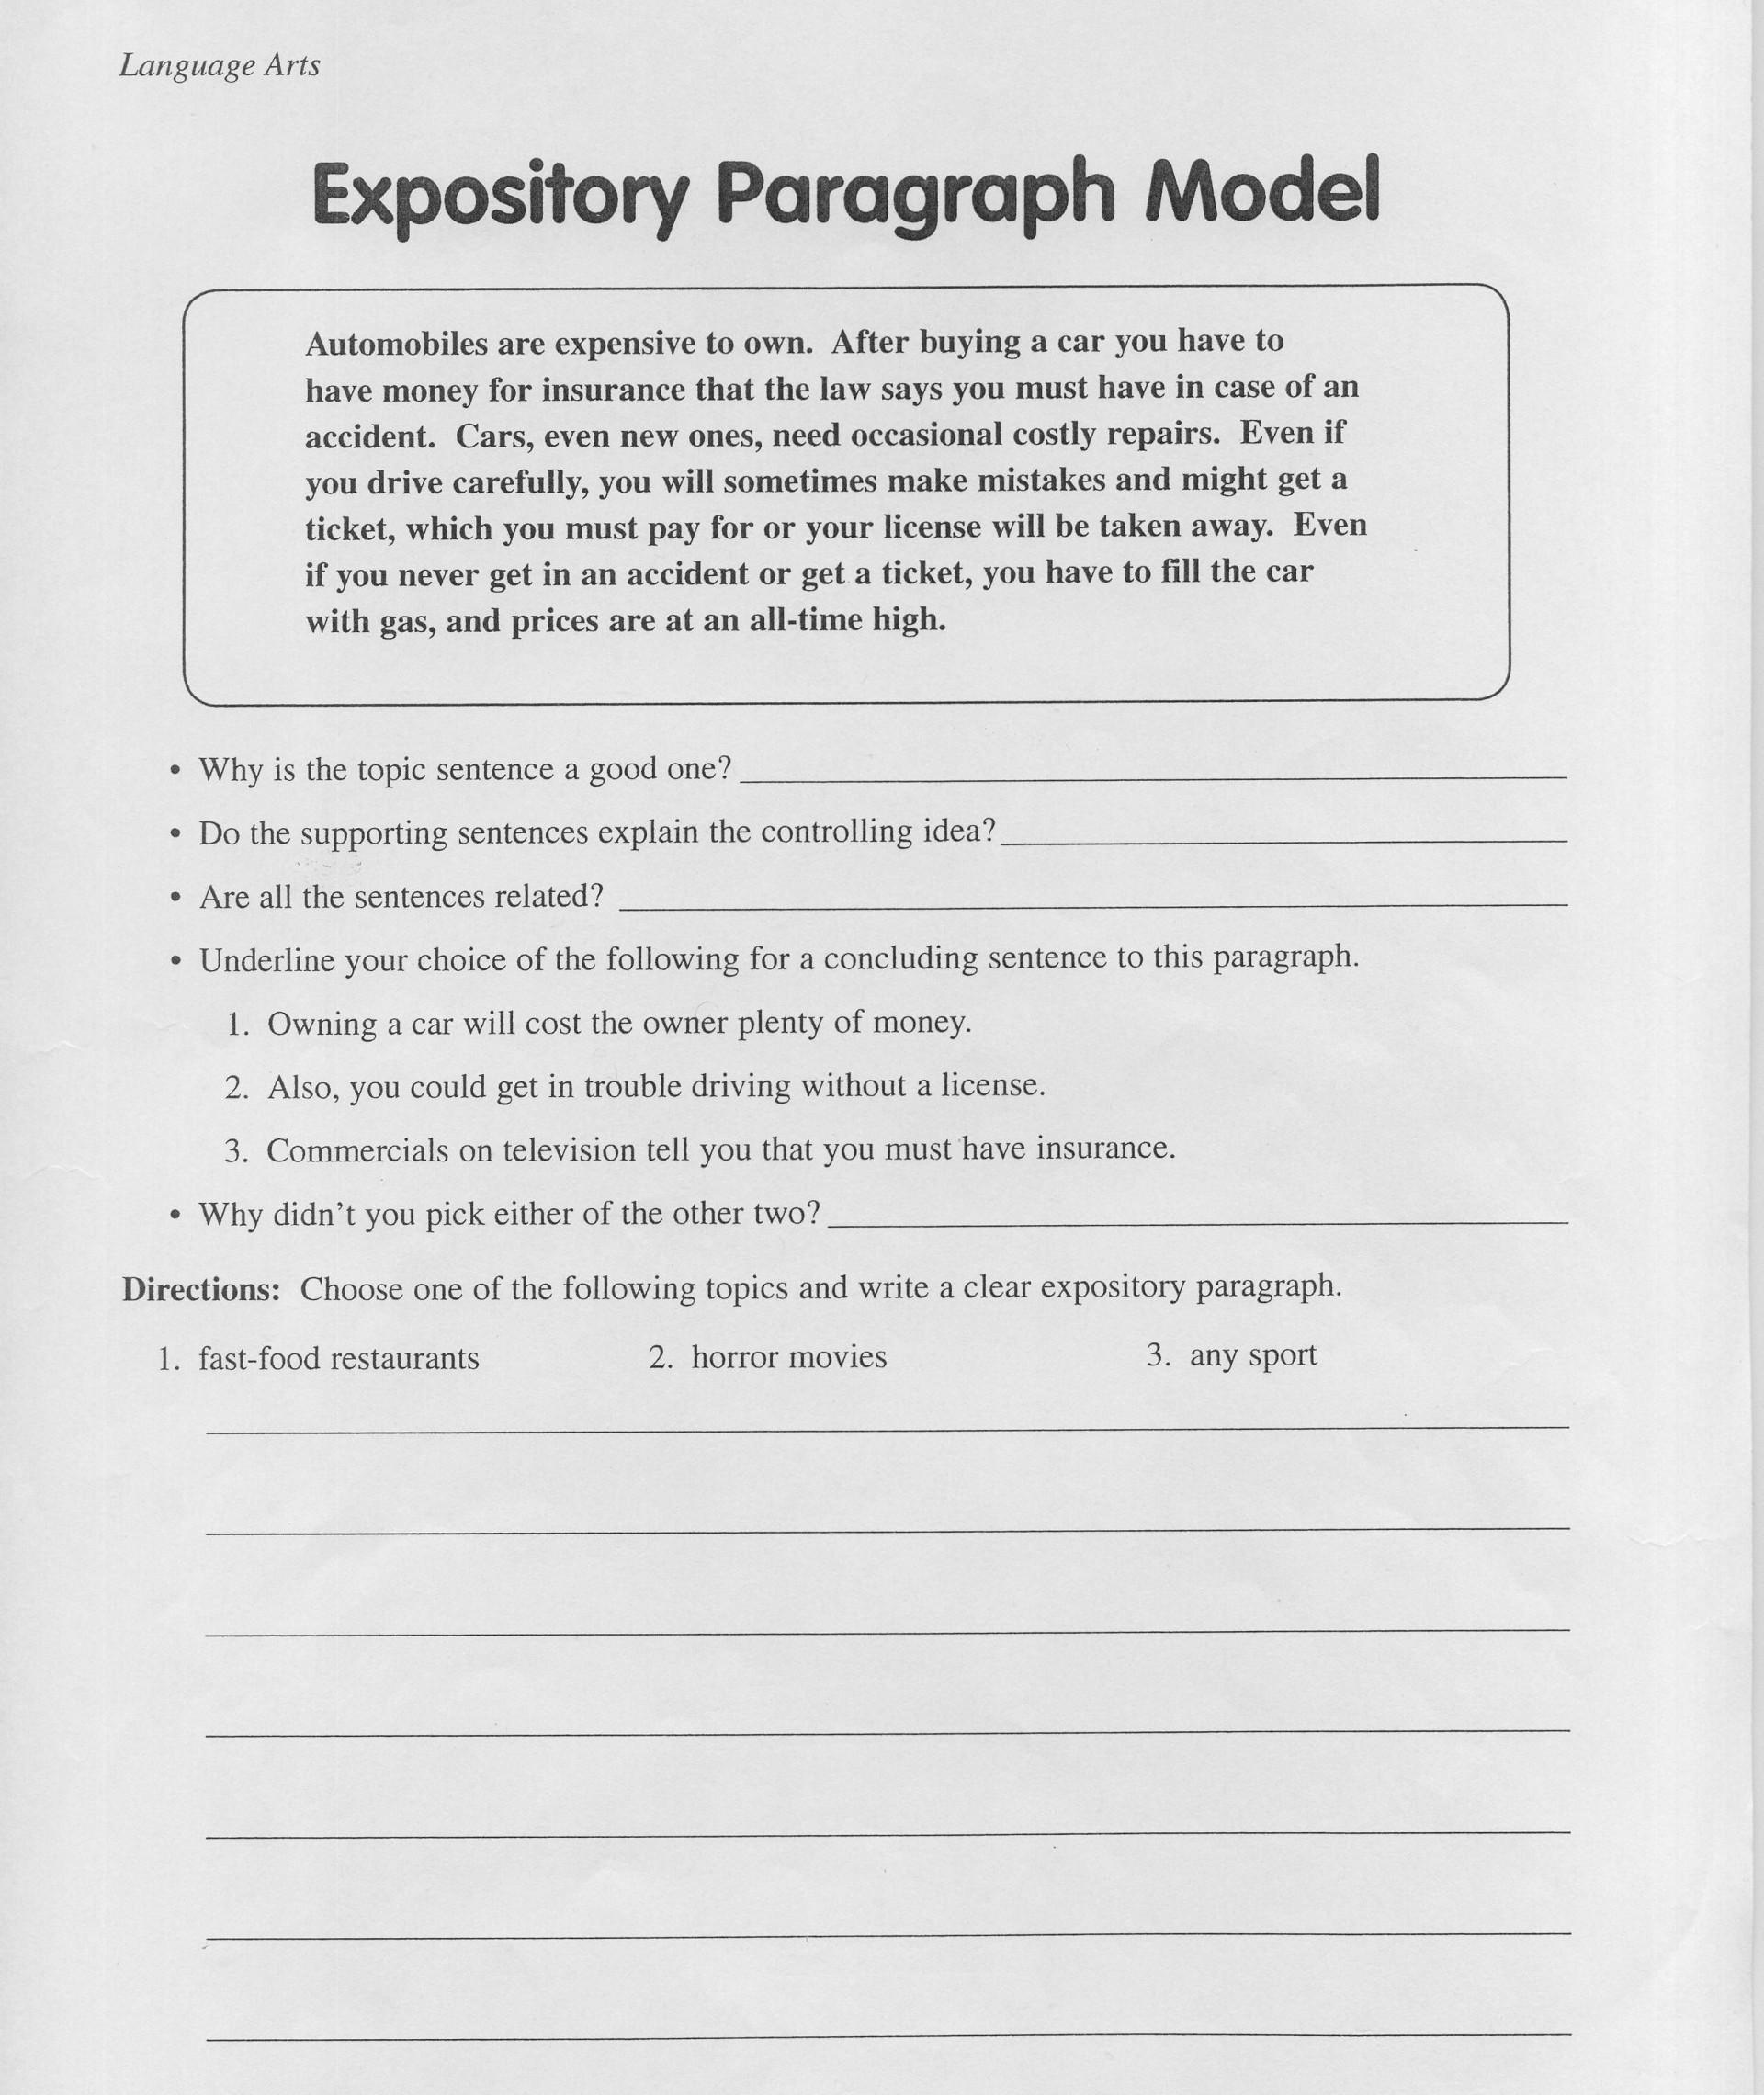 018 Essay Example 6th Grade Argumentative Shocking Examples Persuasive 1920